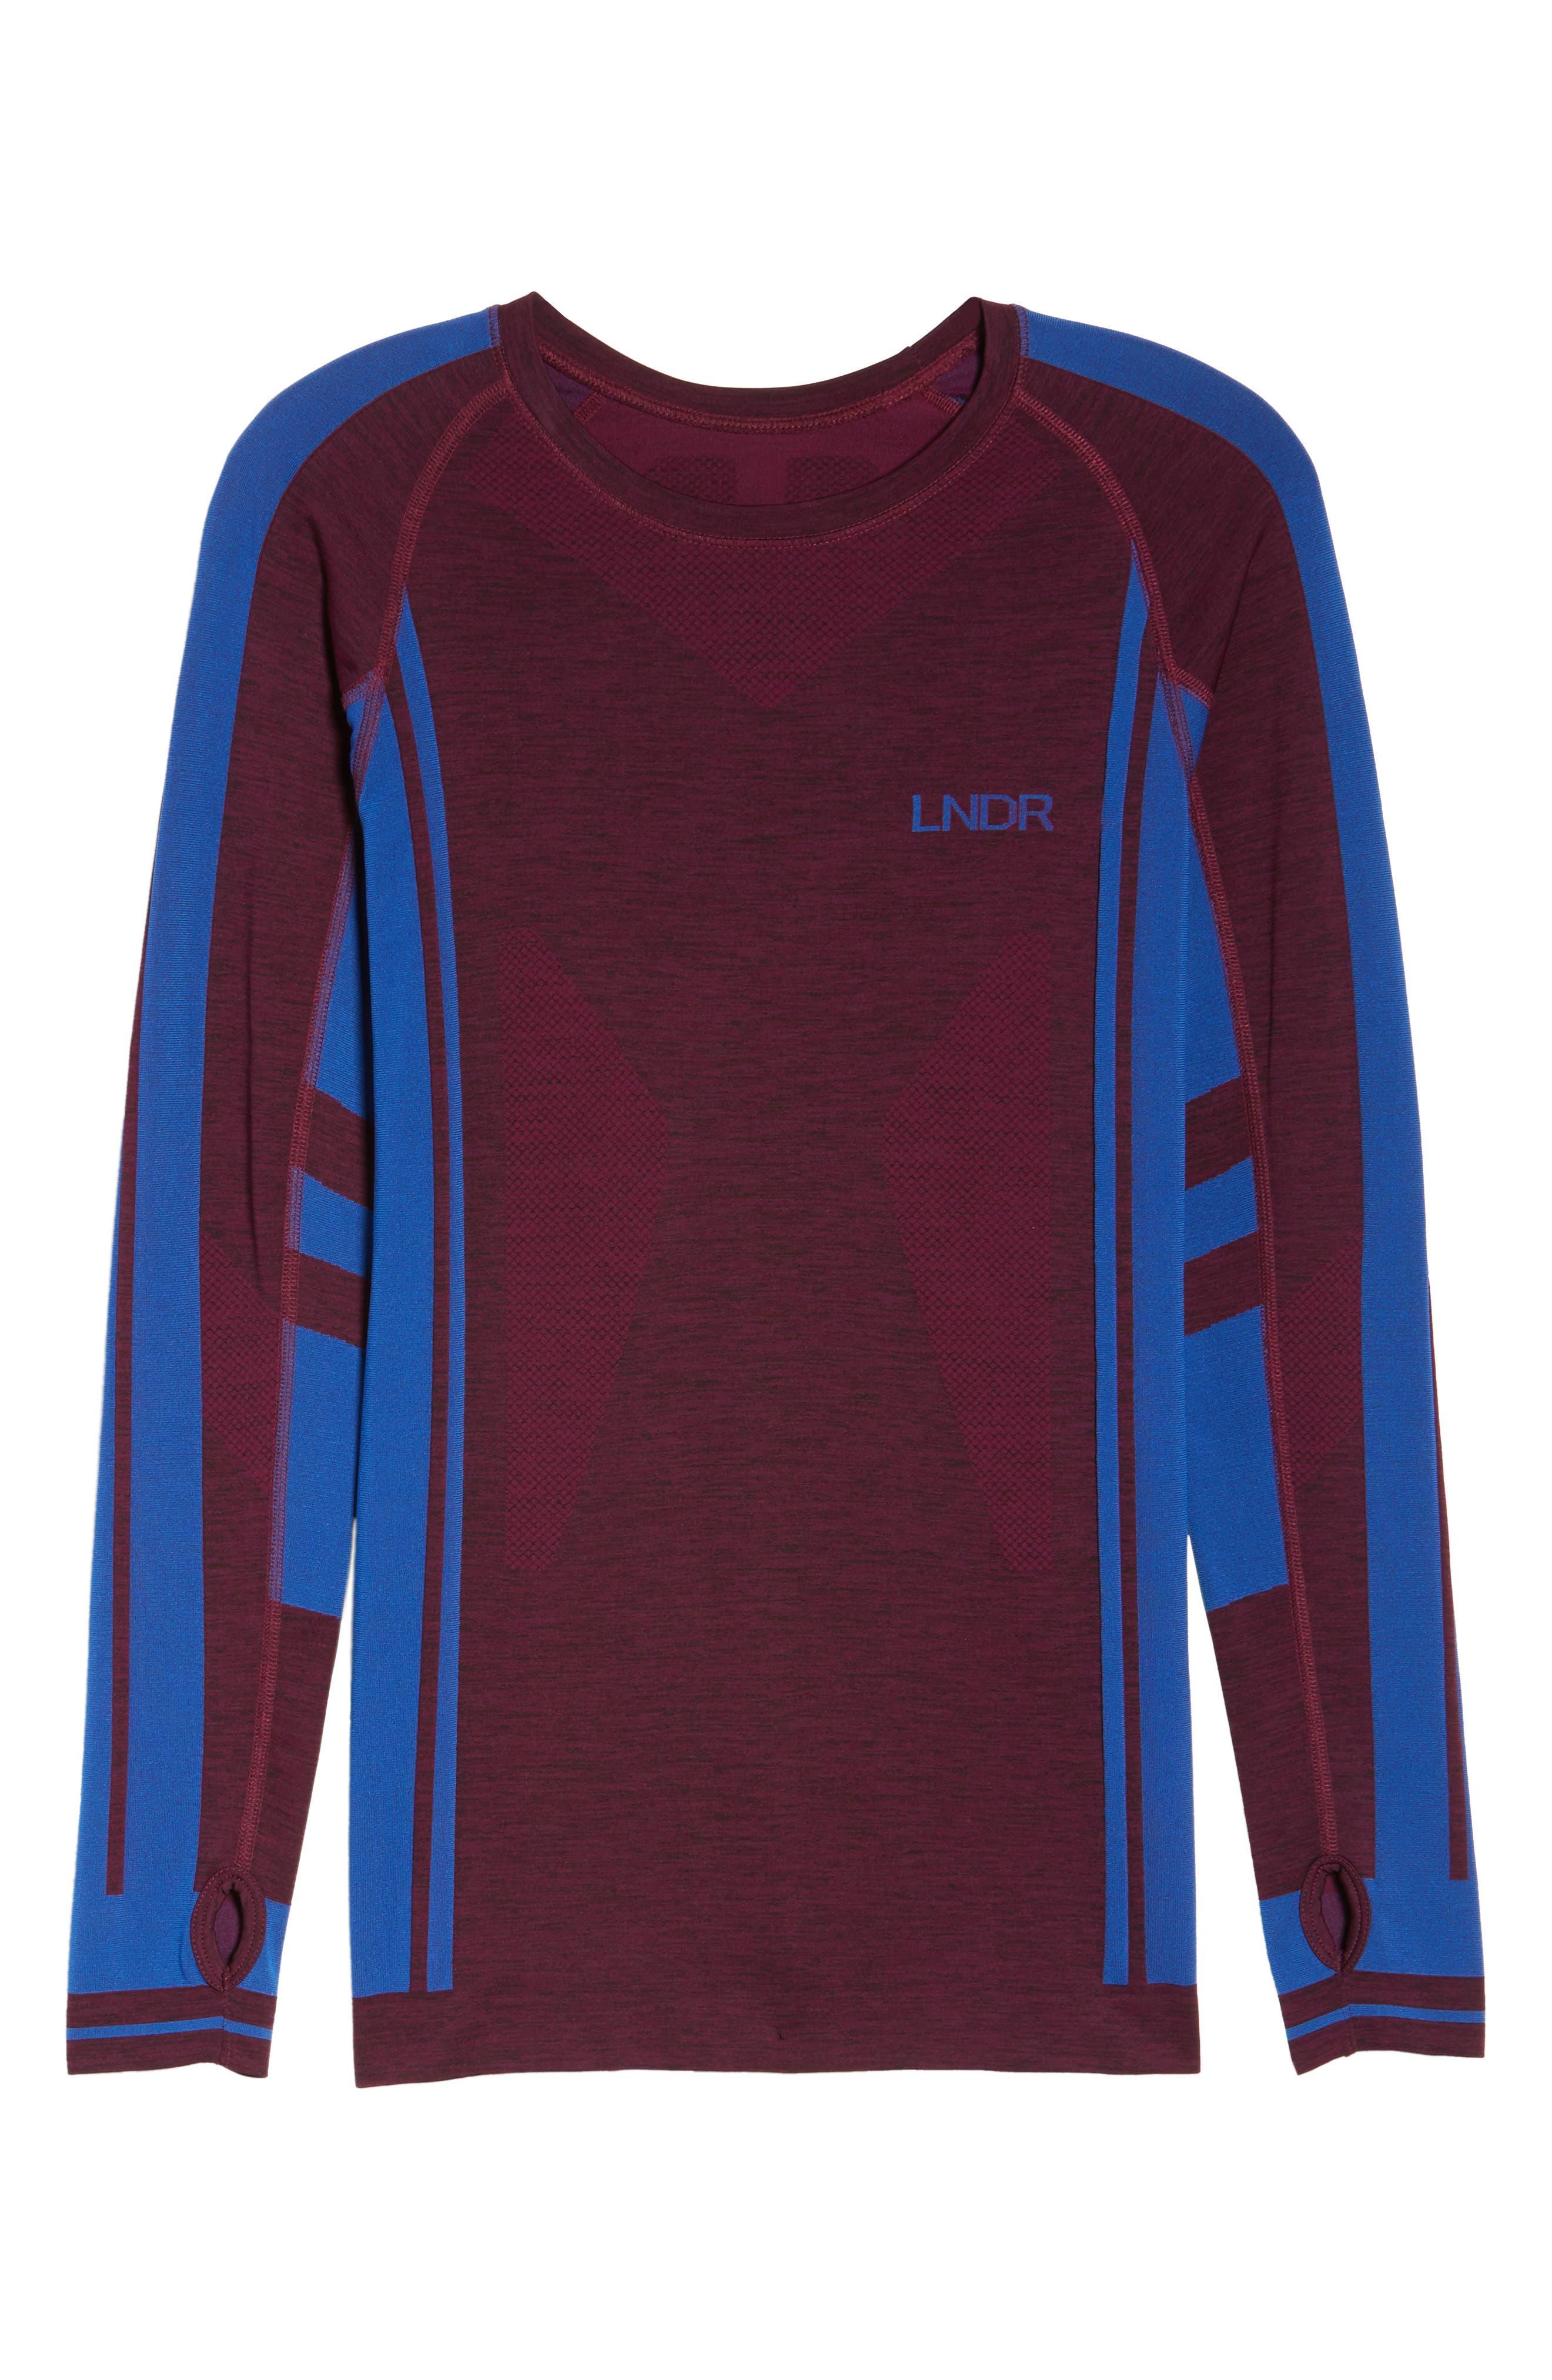 Alternate Image 1 Selected - LNDR Colours Long Sleeve Top